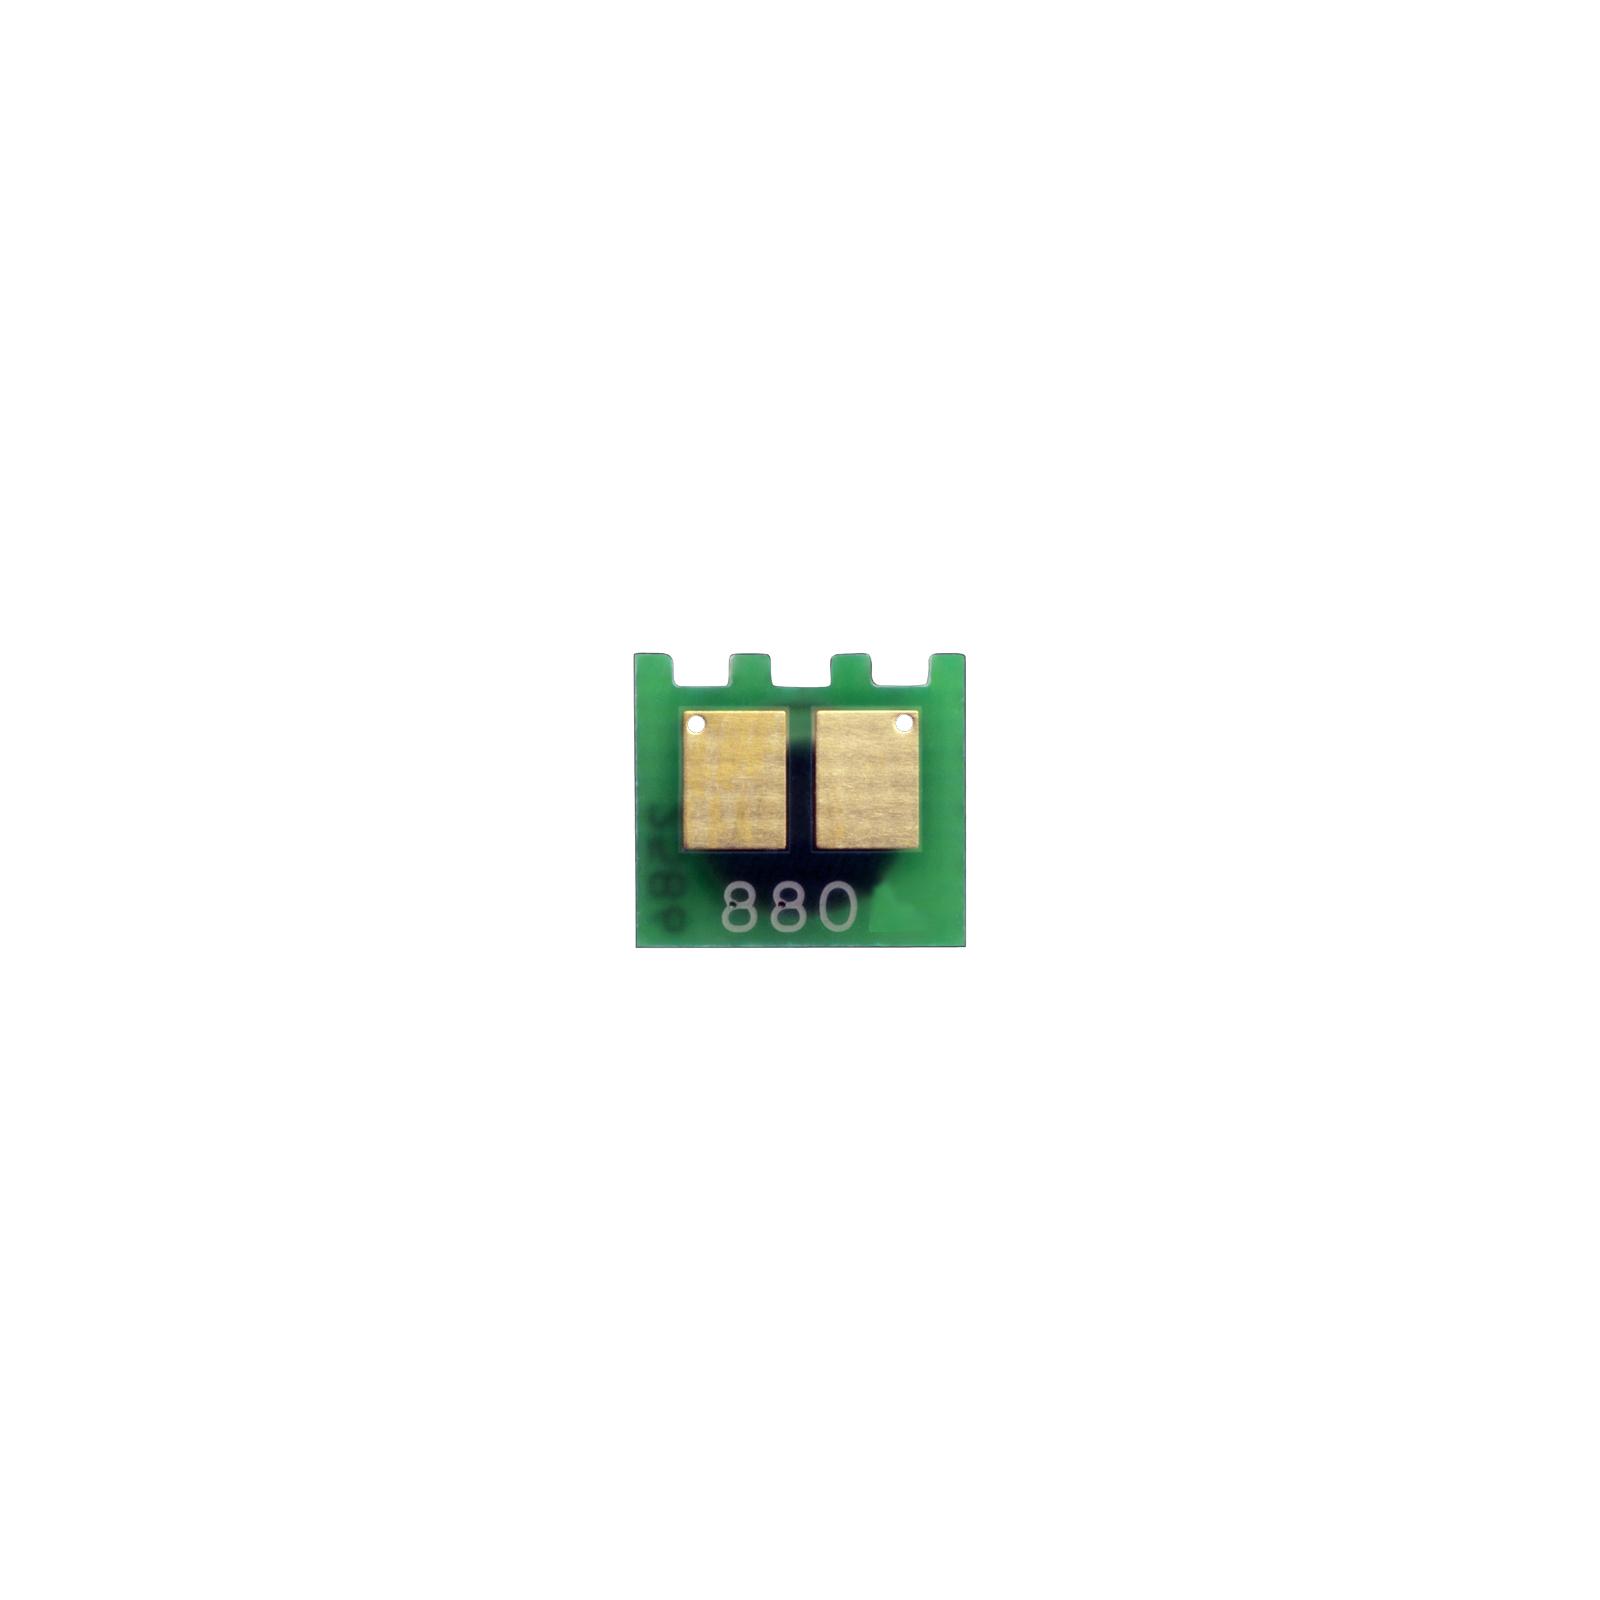 Чип для картриджа HP CLJ M880 (CF300A) 29.5k black Static Control (HP880CP-K)